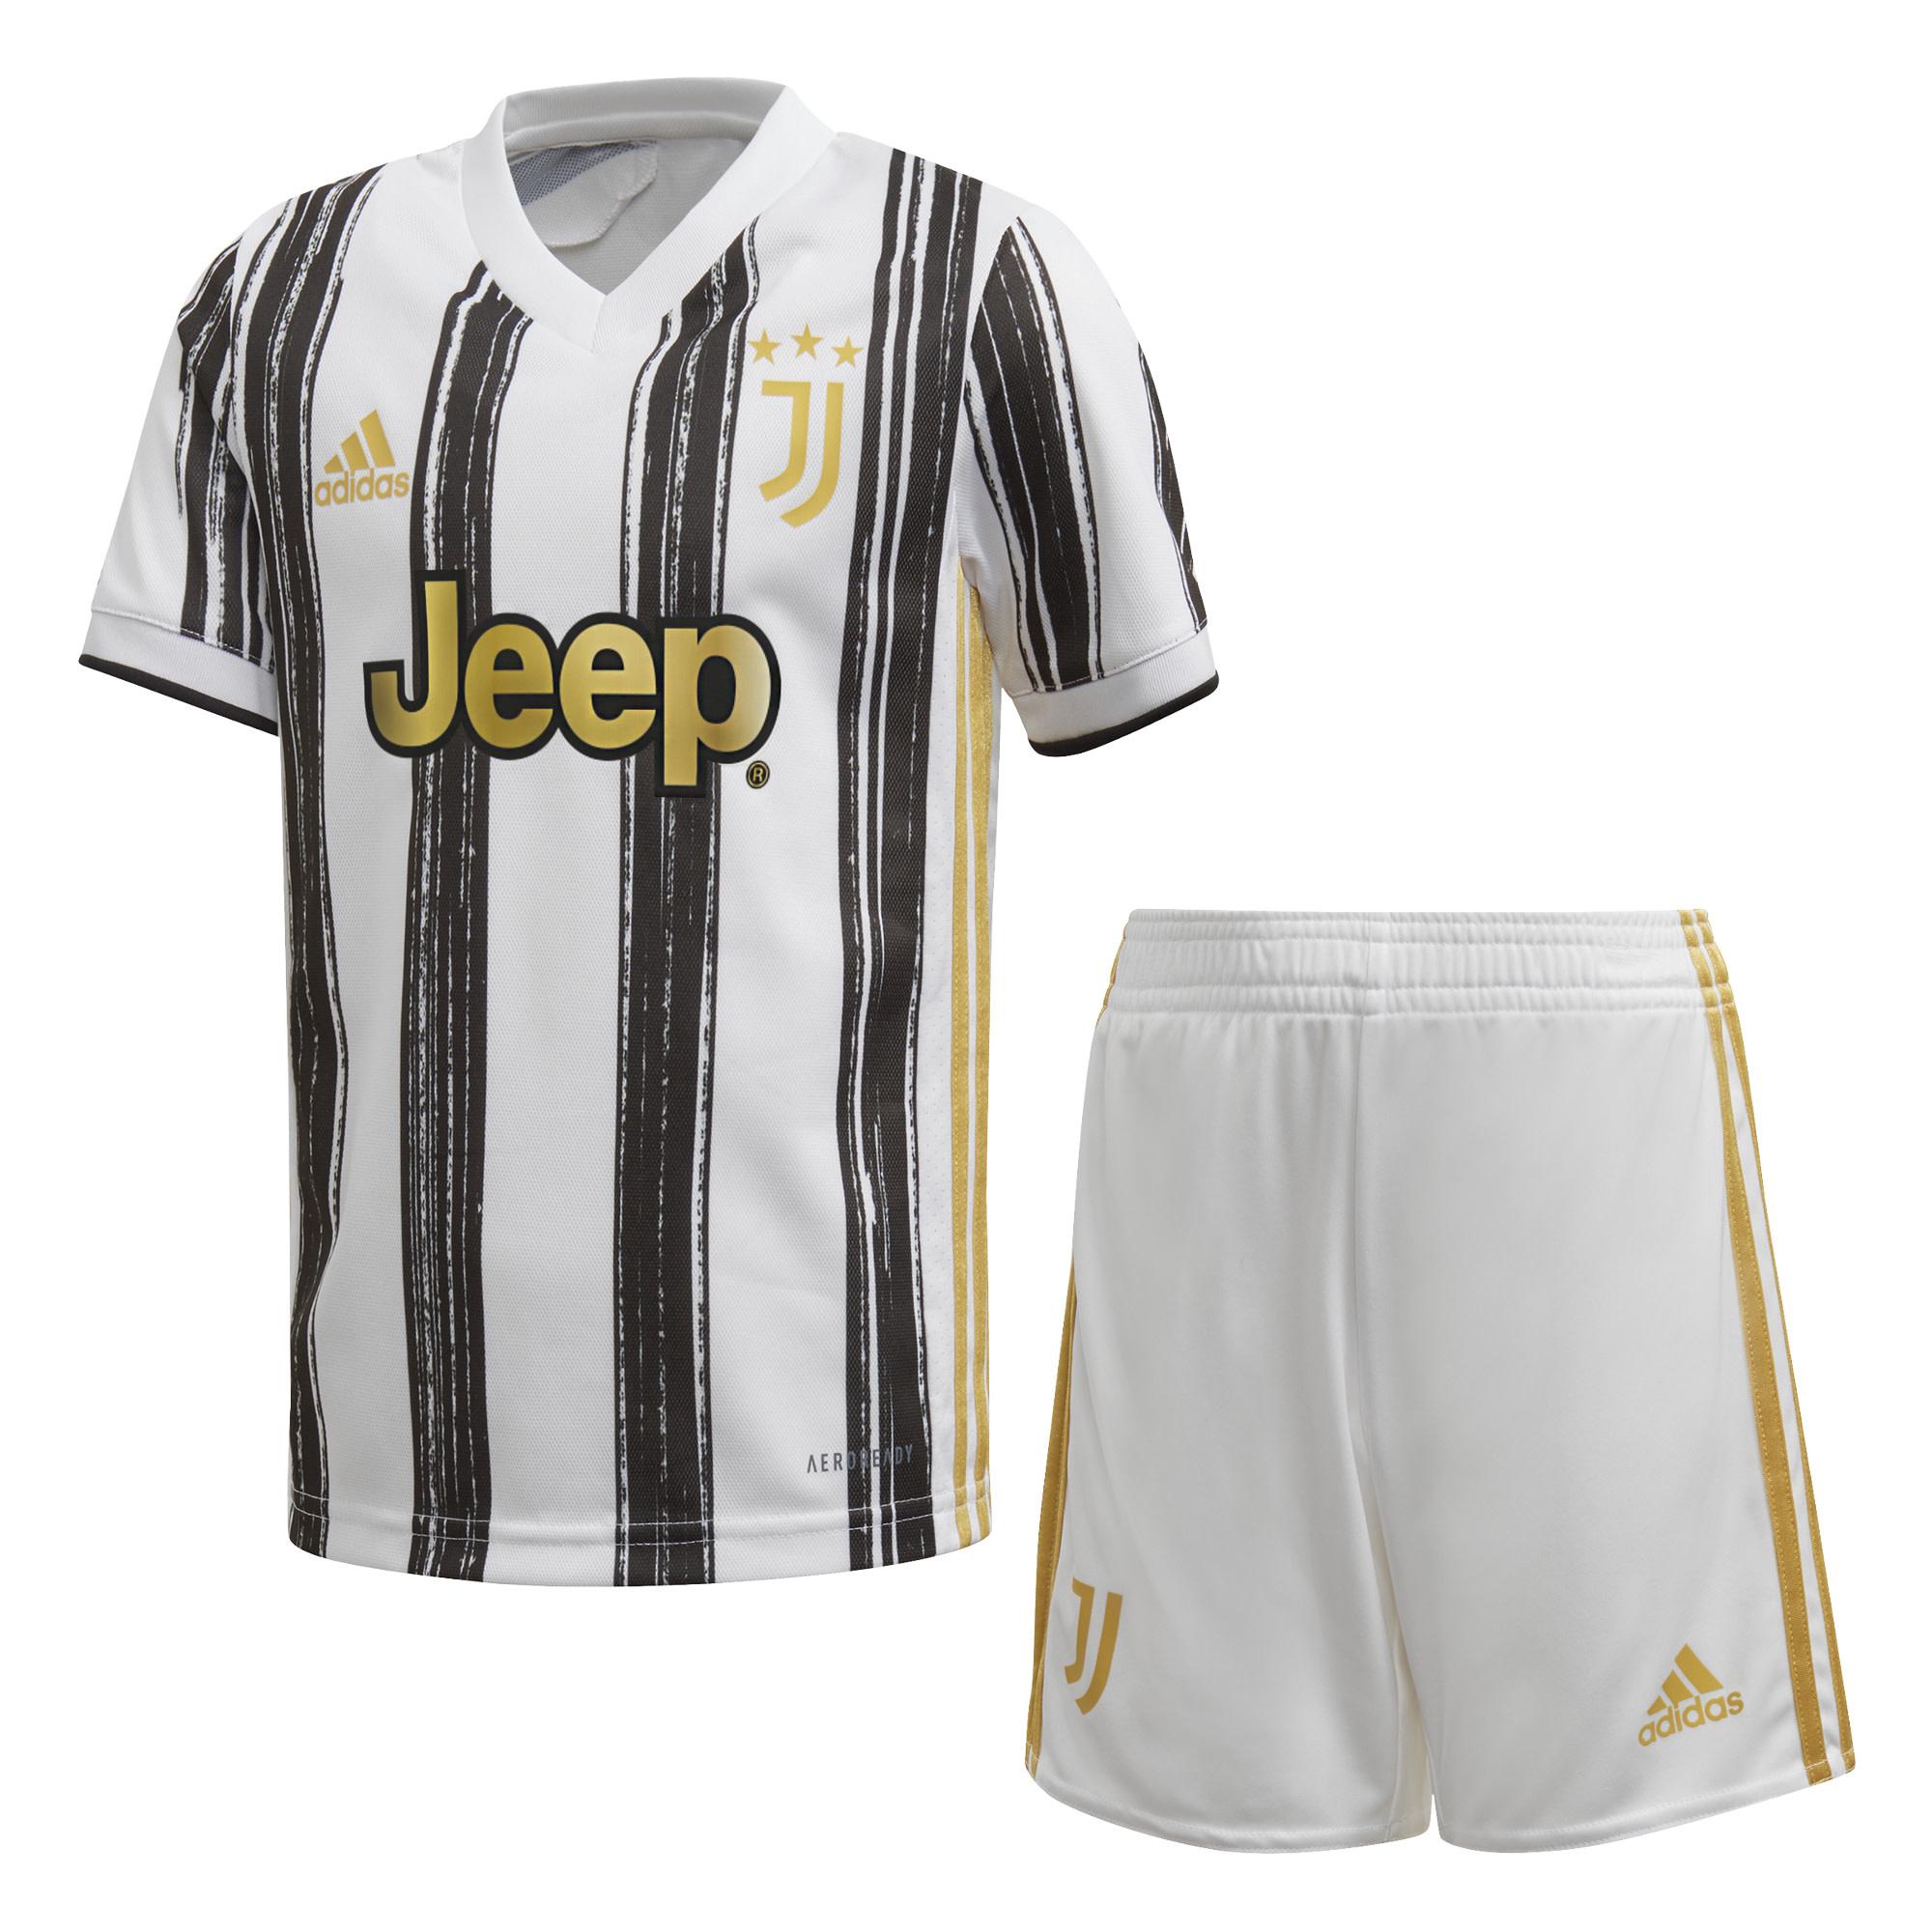 Adidas ADIDAS Juventus Home Mini Set '20-'21